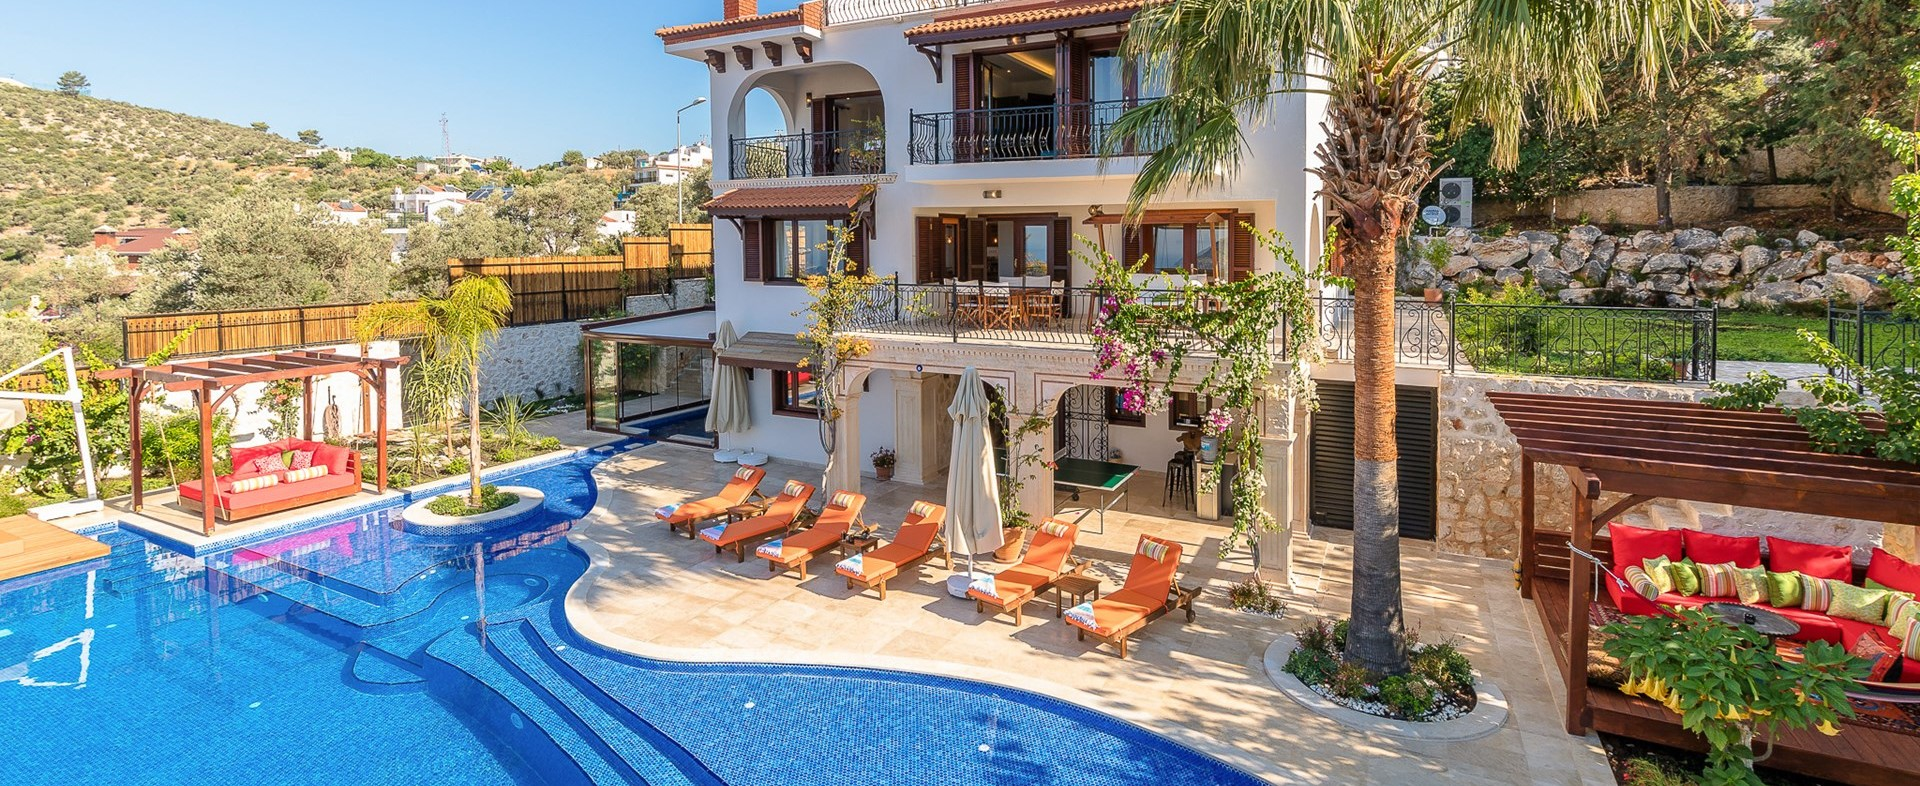 villa-caria-kalkan-5-bedrooms